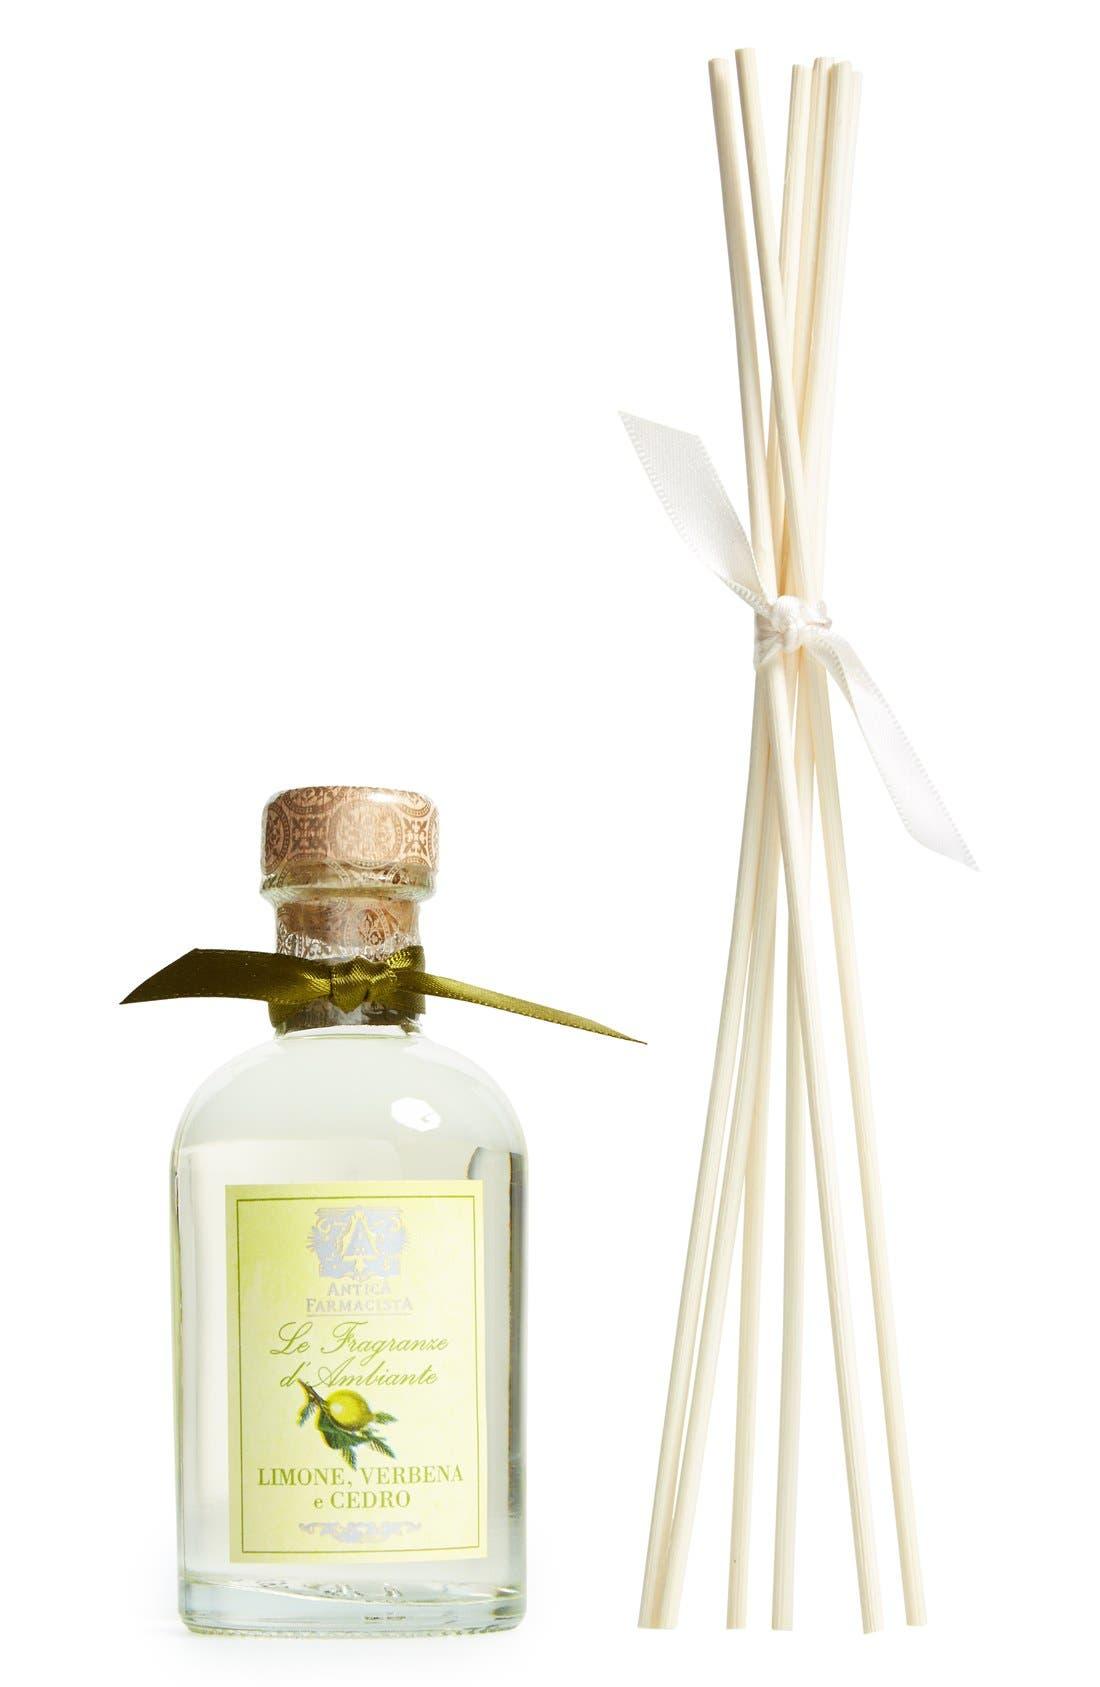 ANTICA FARMACISTA 'Lemon, Verbena & Cedar' Home Ambiance